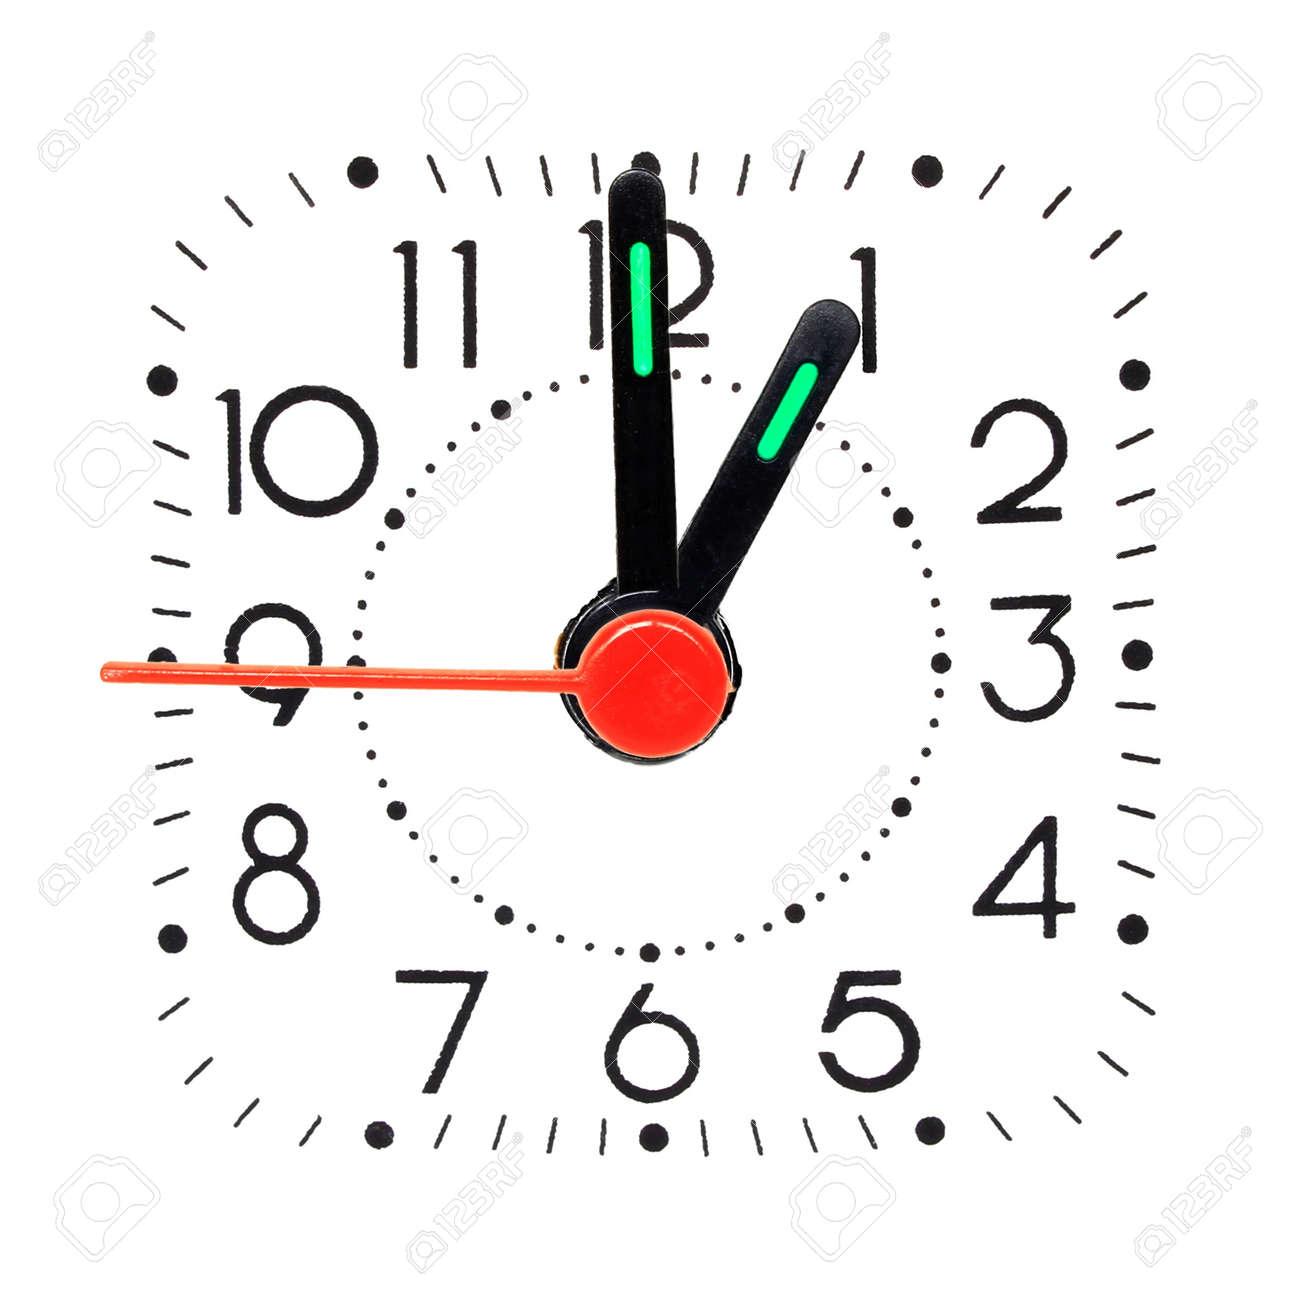 Clock Showing 10 O'clock Clock Showing 1 O'clock